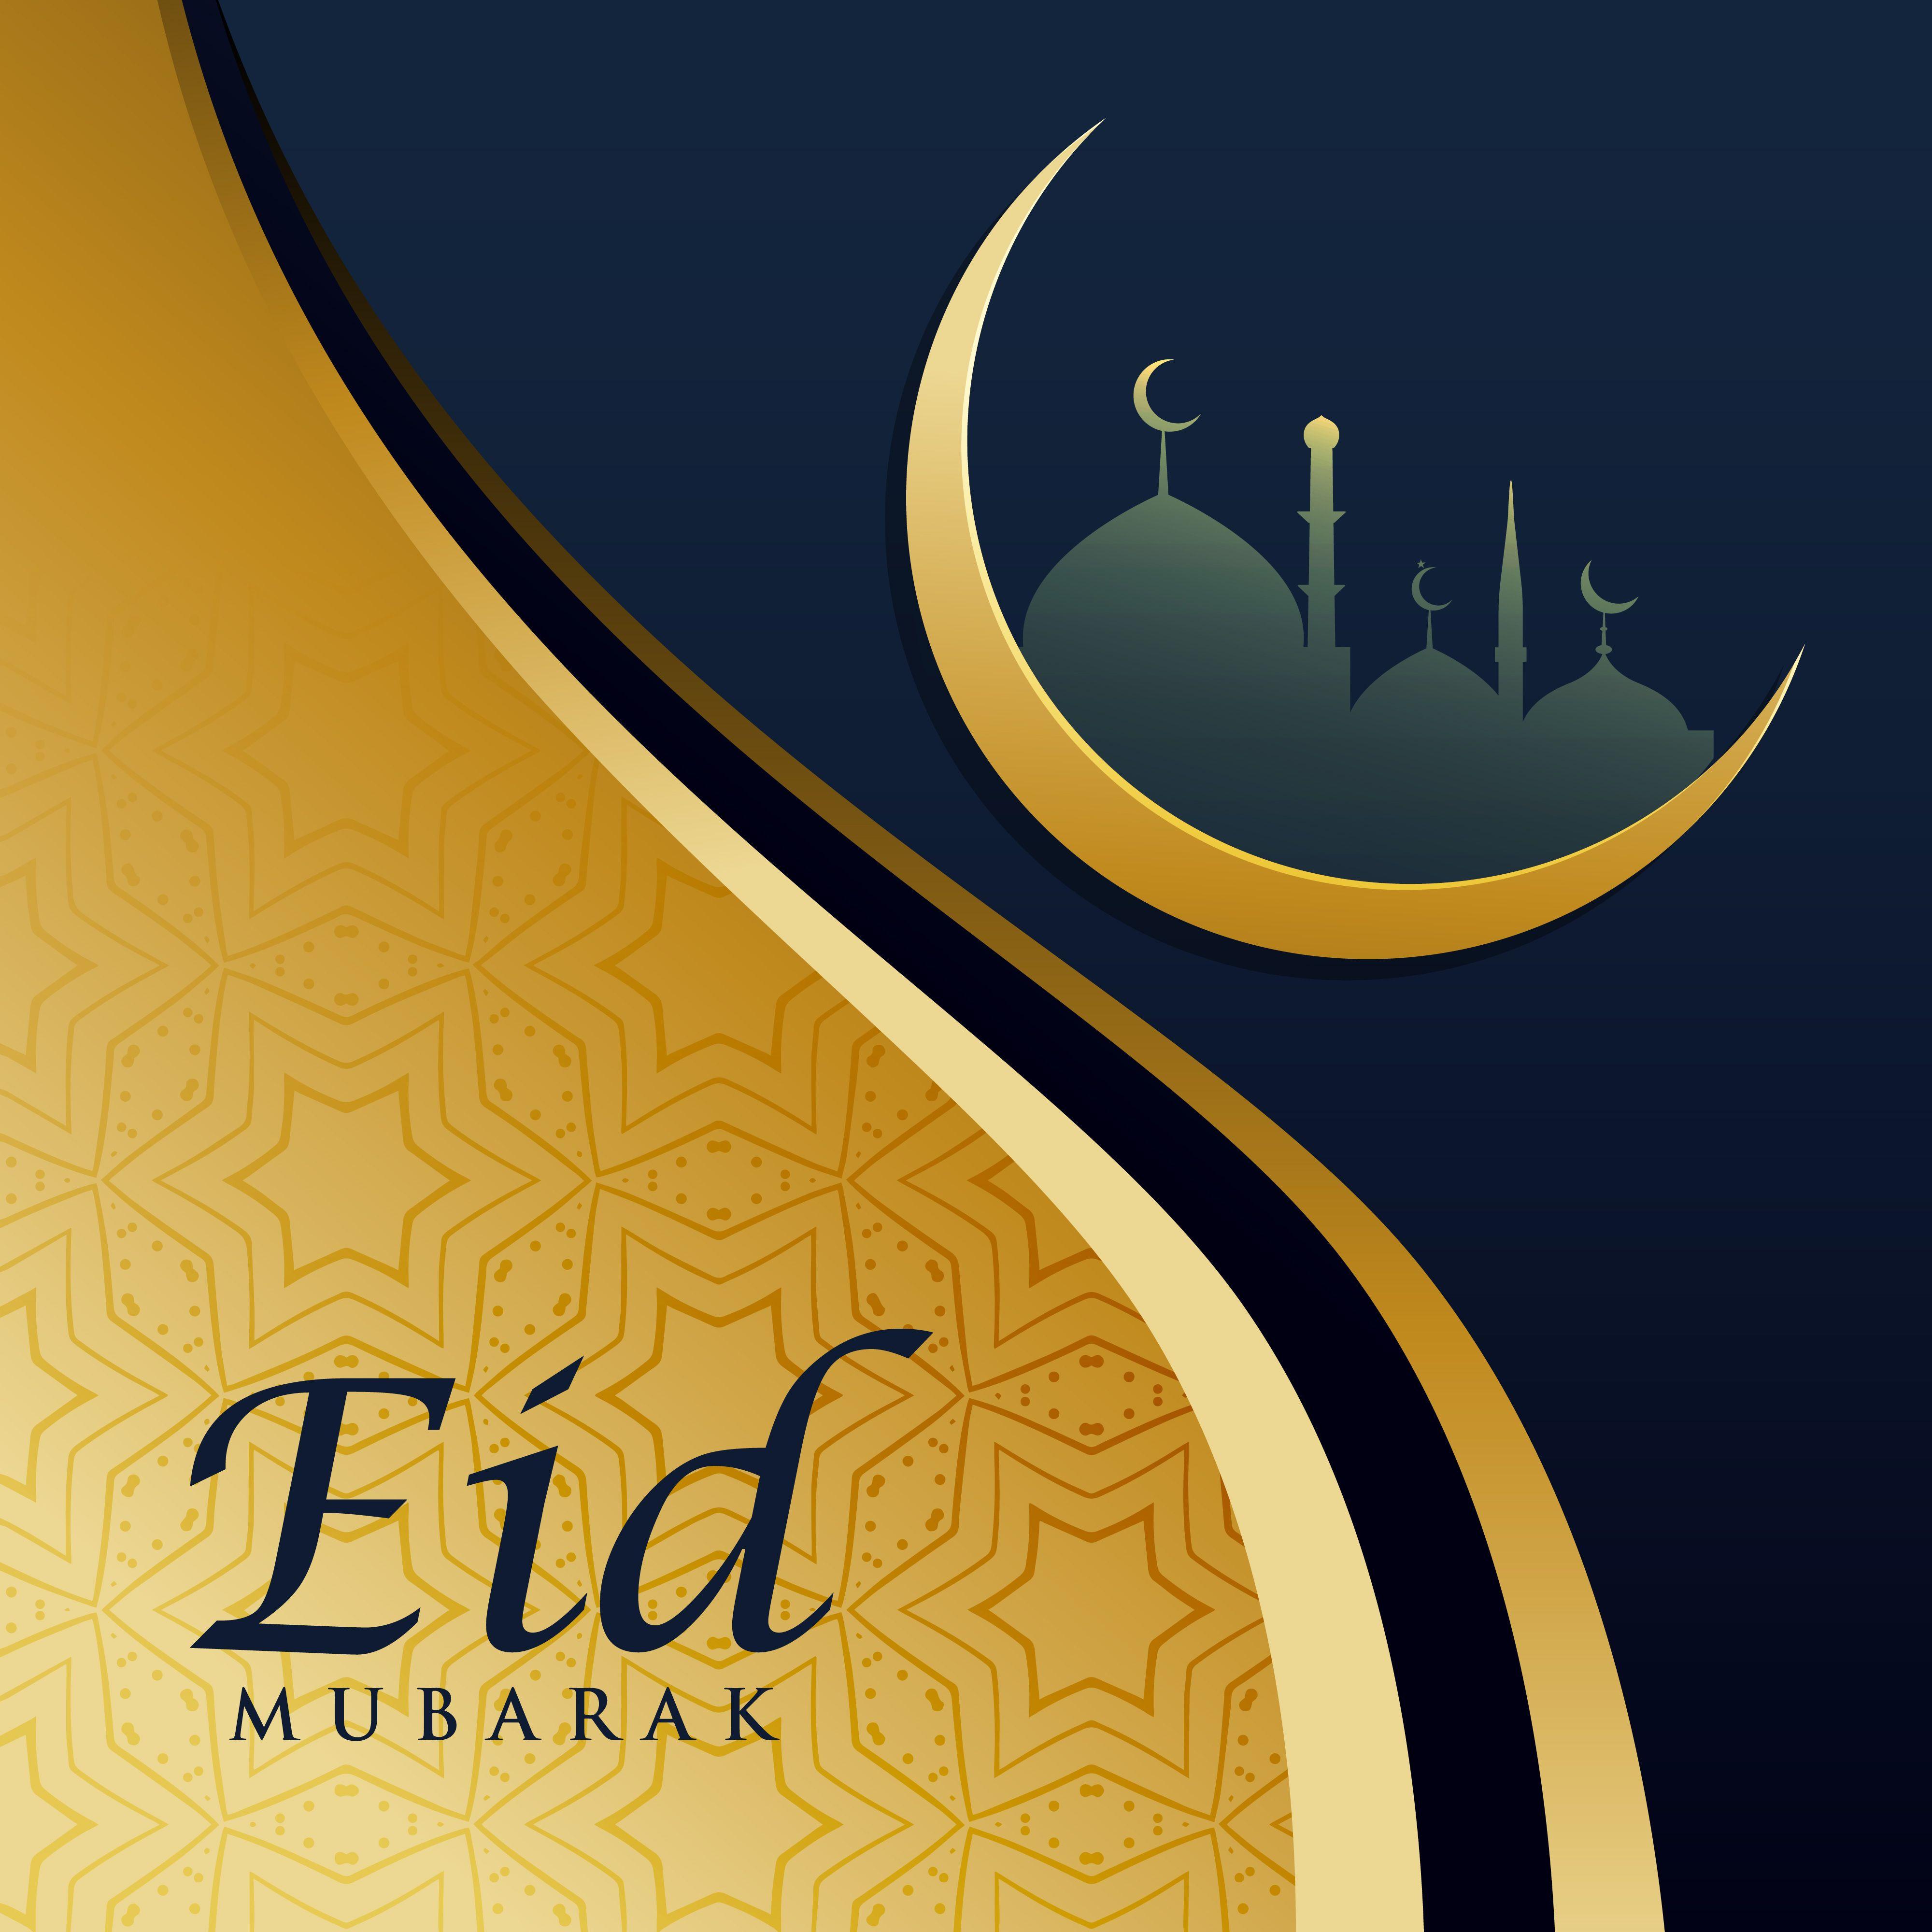 Elegant Eid Festival Greeting Card Design In Golden Theme Eid Mubarak Background Eid Mubarak Images Eid Greetings